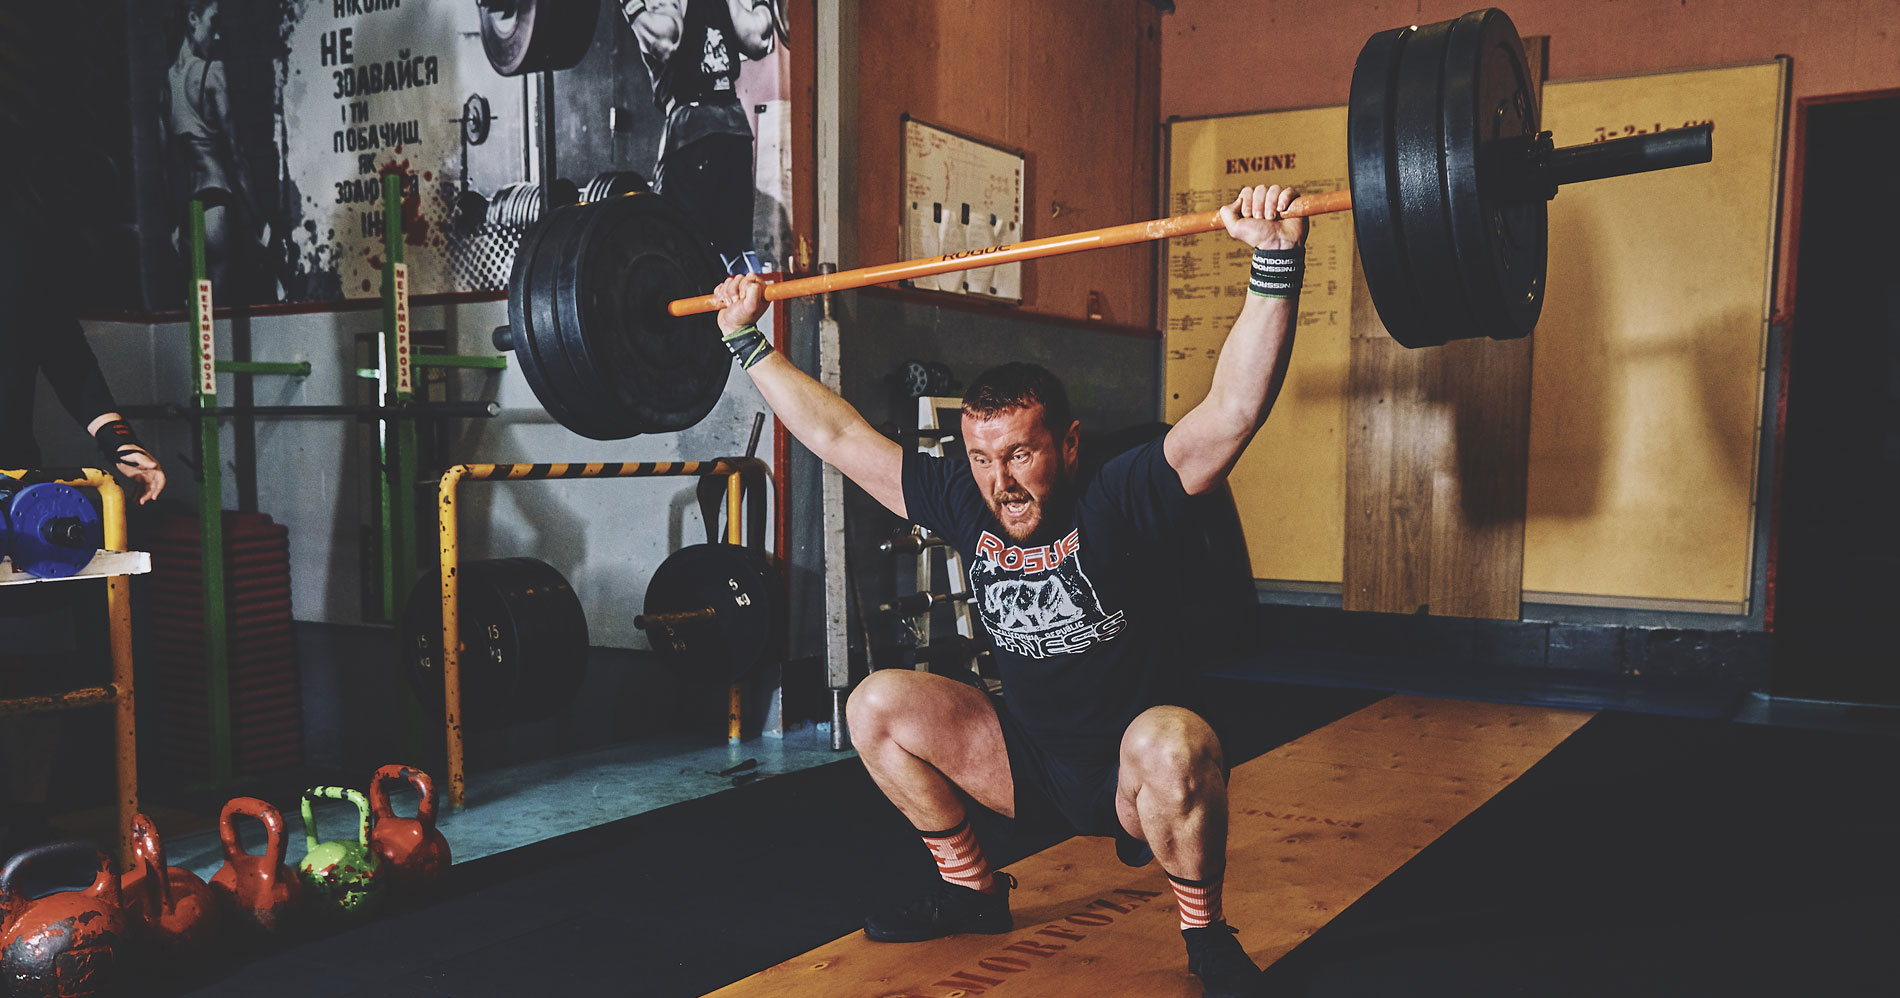 Спорт-клуб Метаморфоза - CrossFit